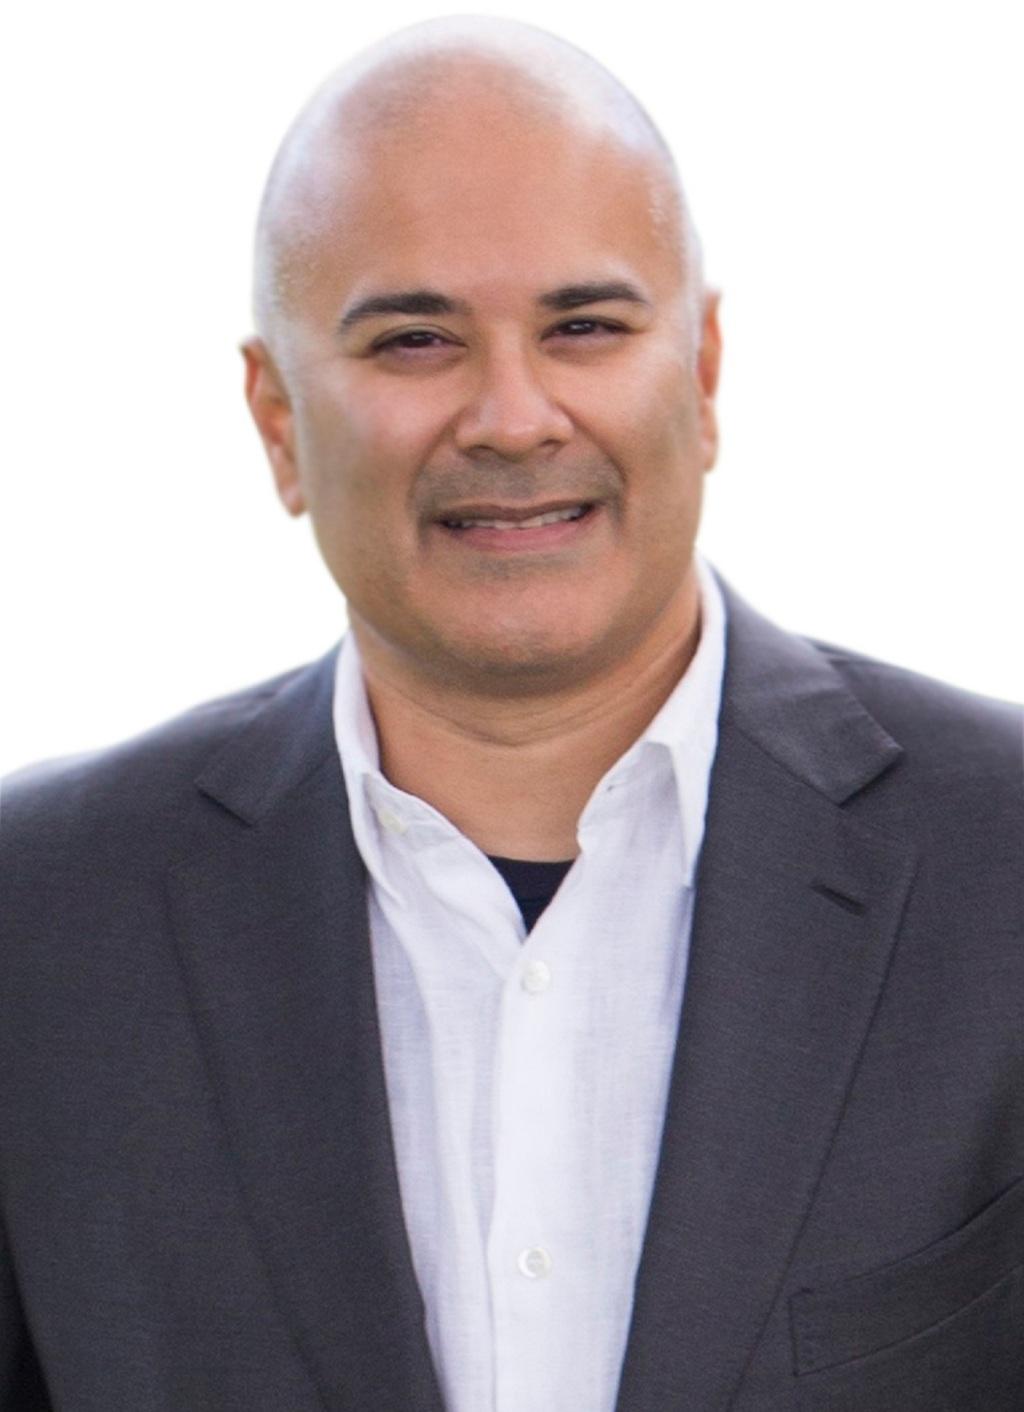 ראקש לונקאר ממייסדי ונשיא טרנסמיט סקיוריטי transmit security